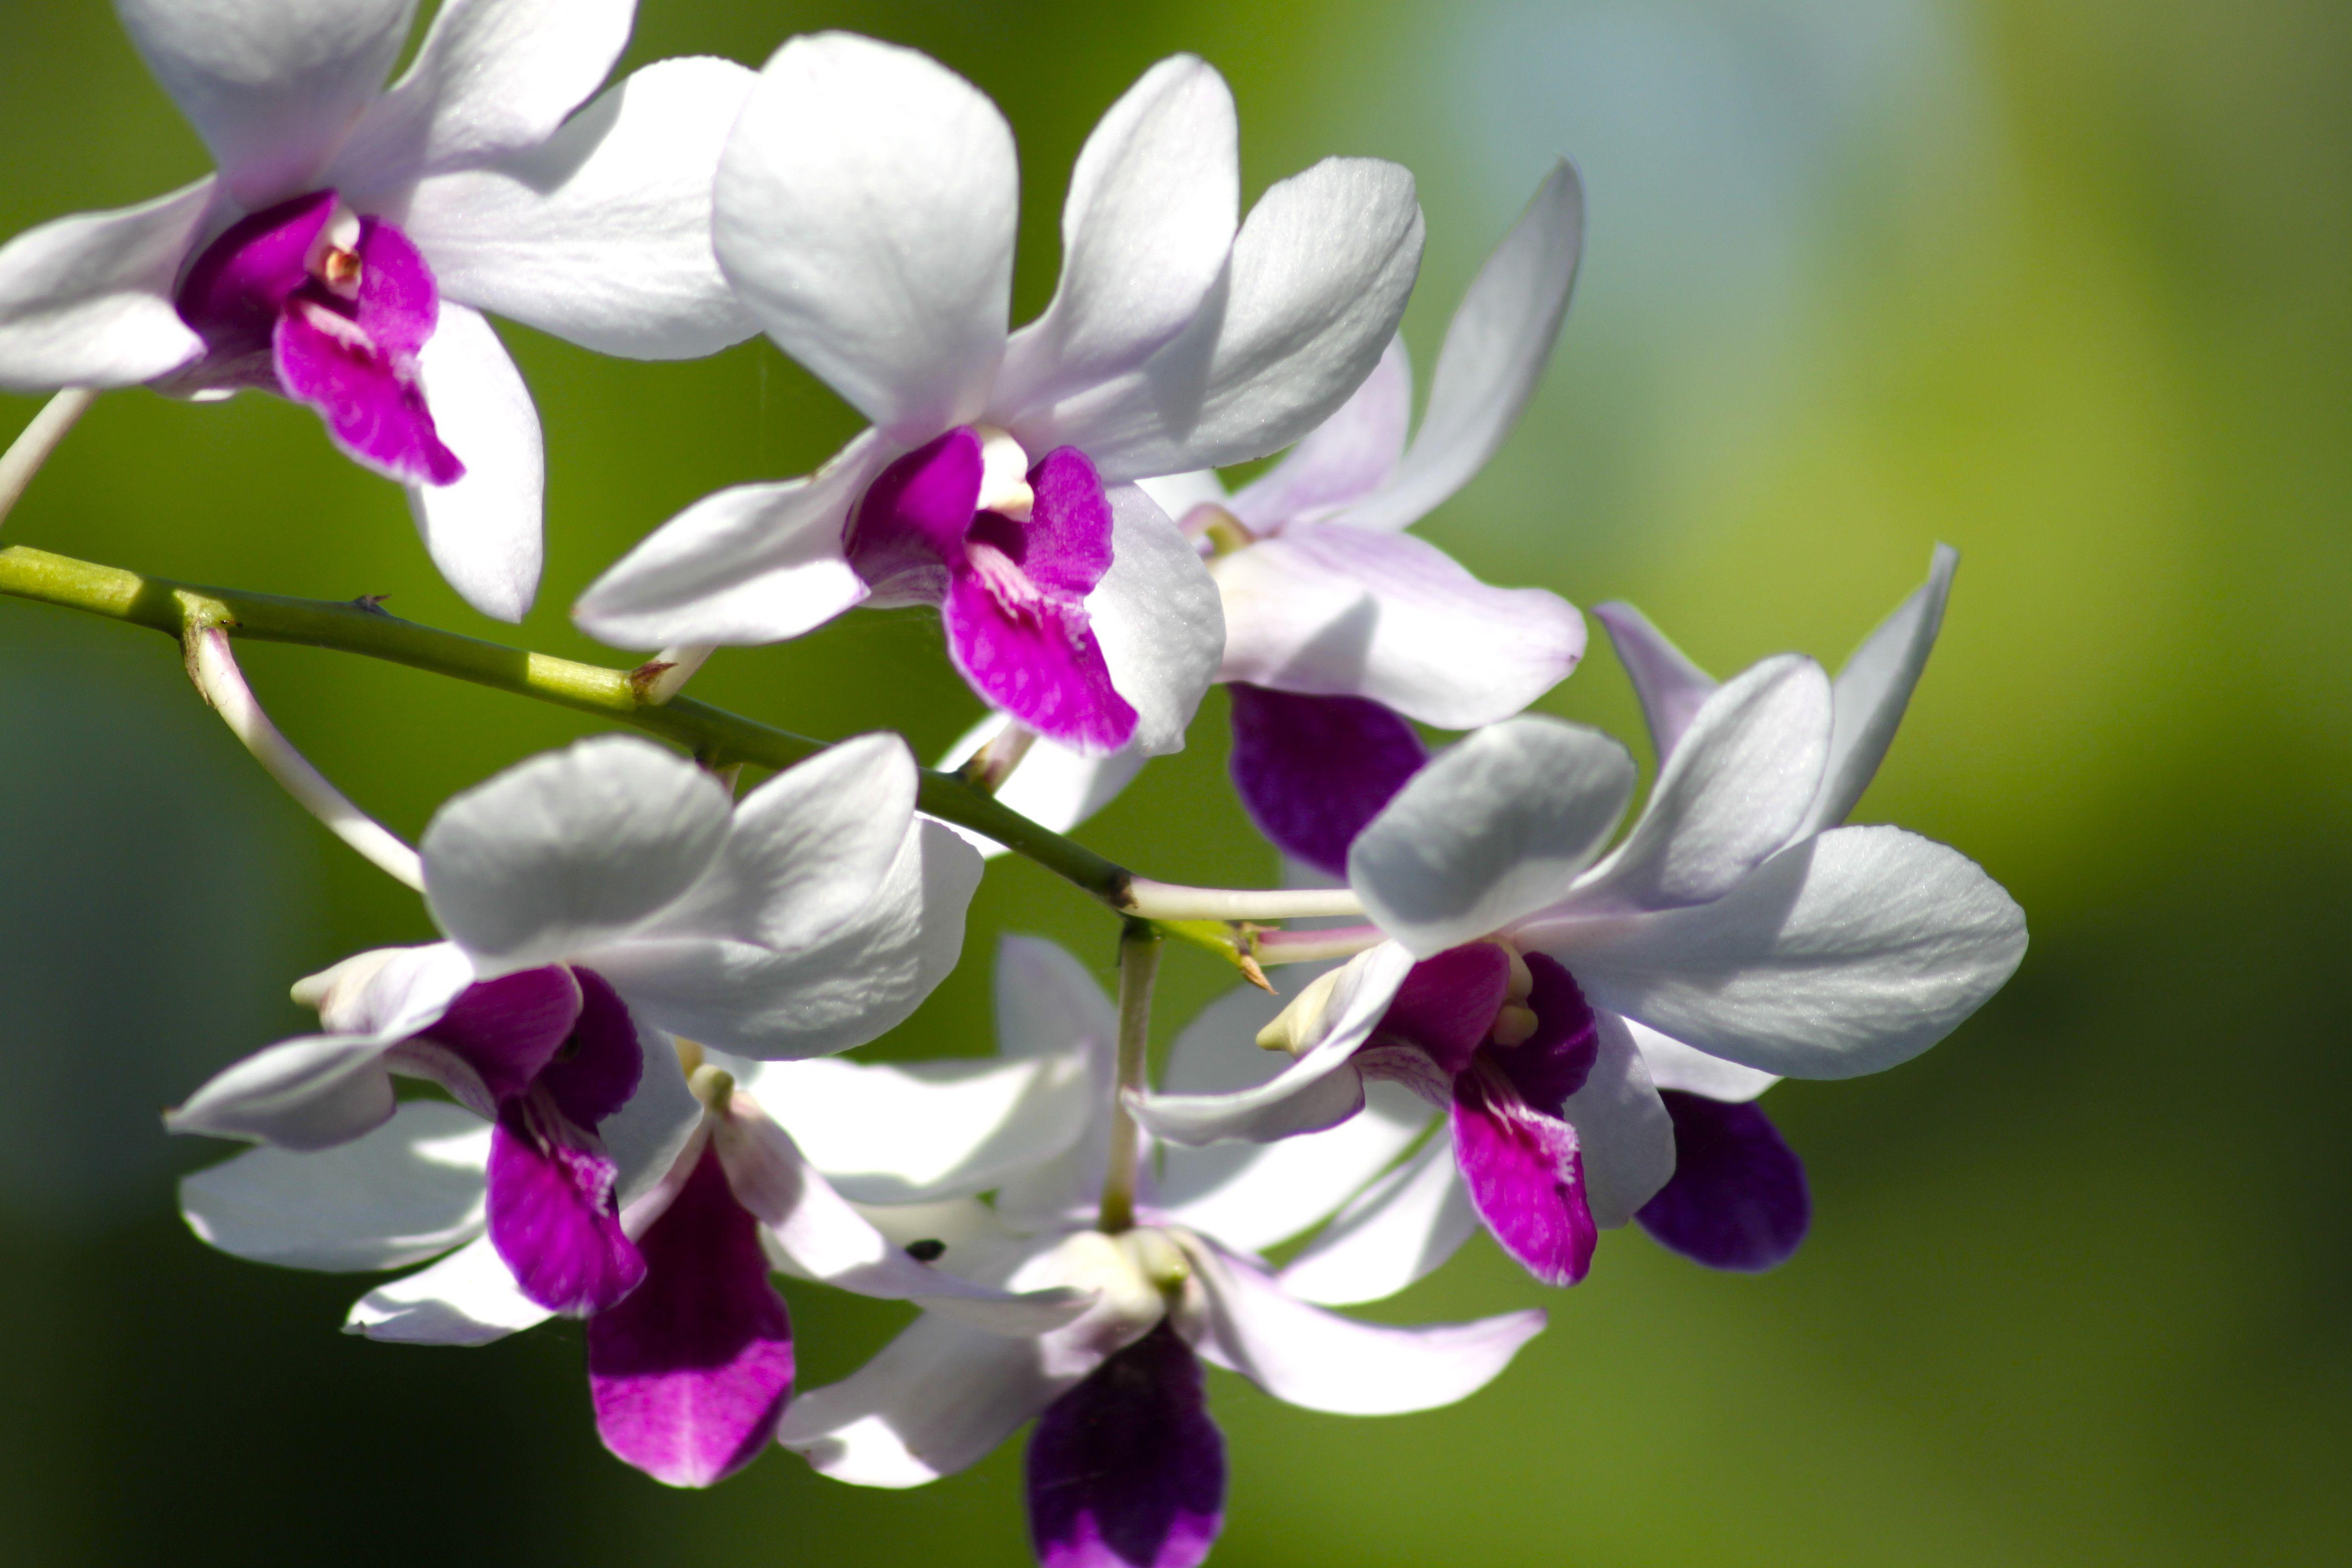 Bunga Anggrek Plants Flowers Garden